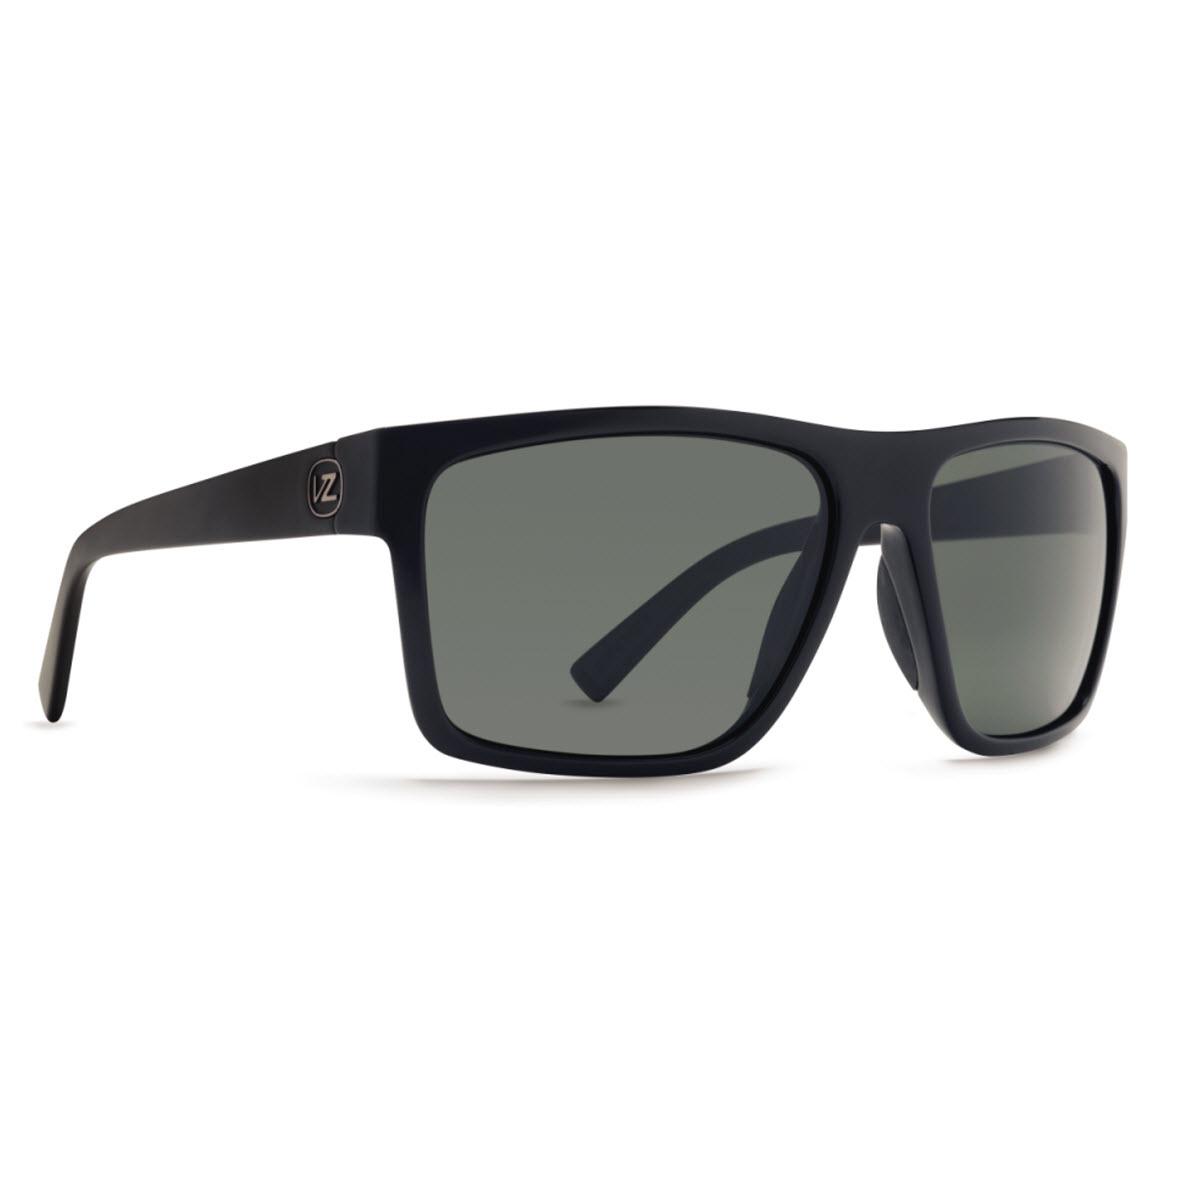 Product image of VonZipper Dipstick Sunglasses in Black Satin - Grey Lens